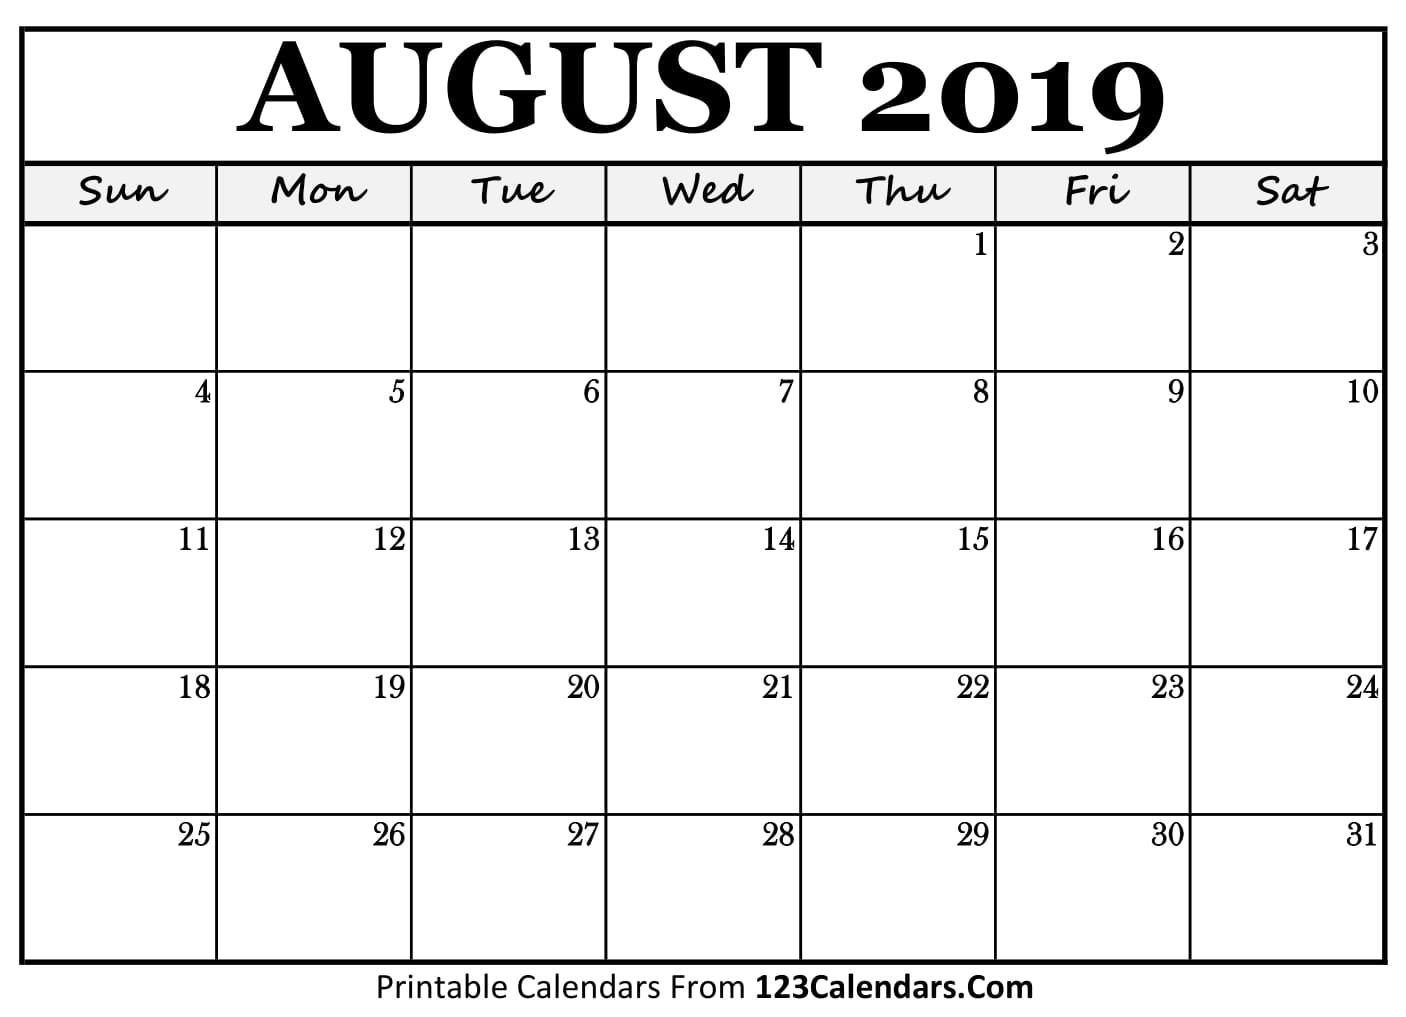 August 2019 Printable Calendar | 123Calendars with regard to August Calendar Template Printable